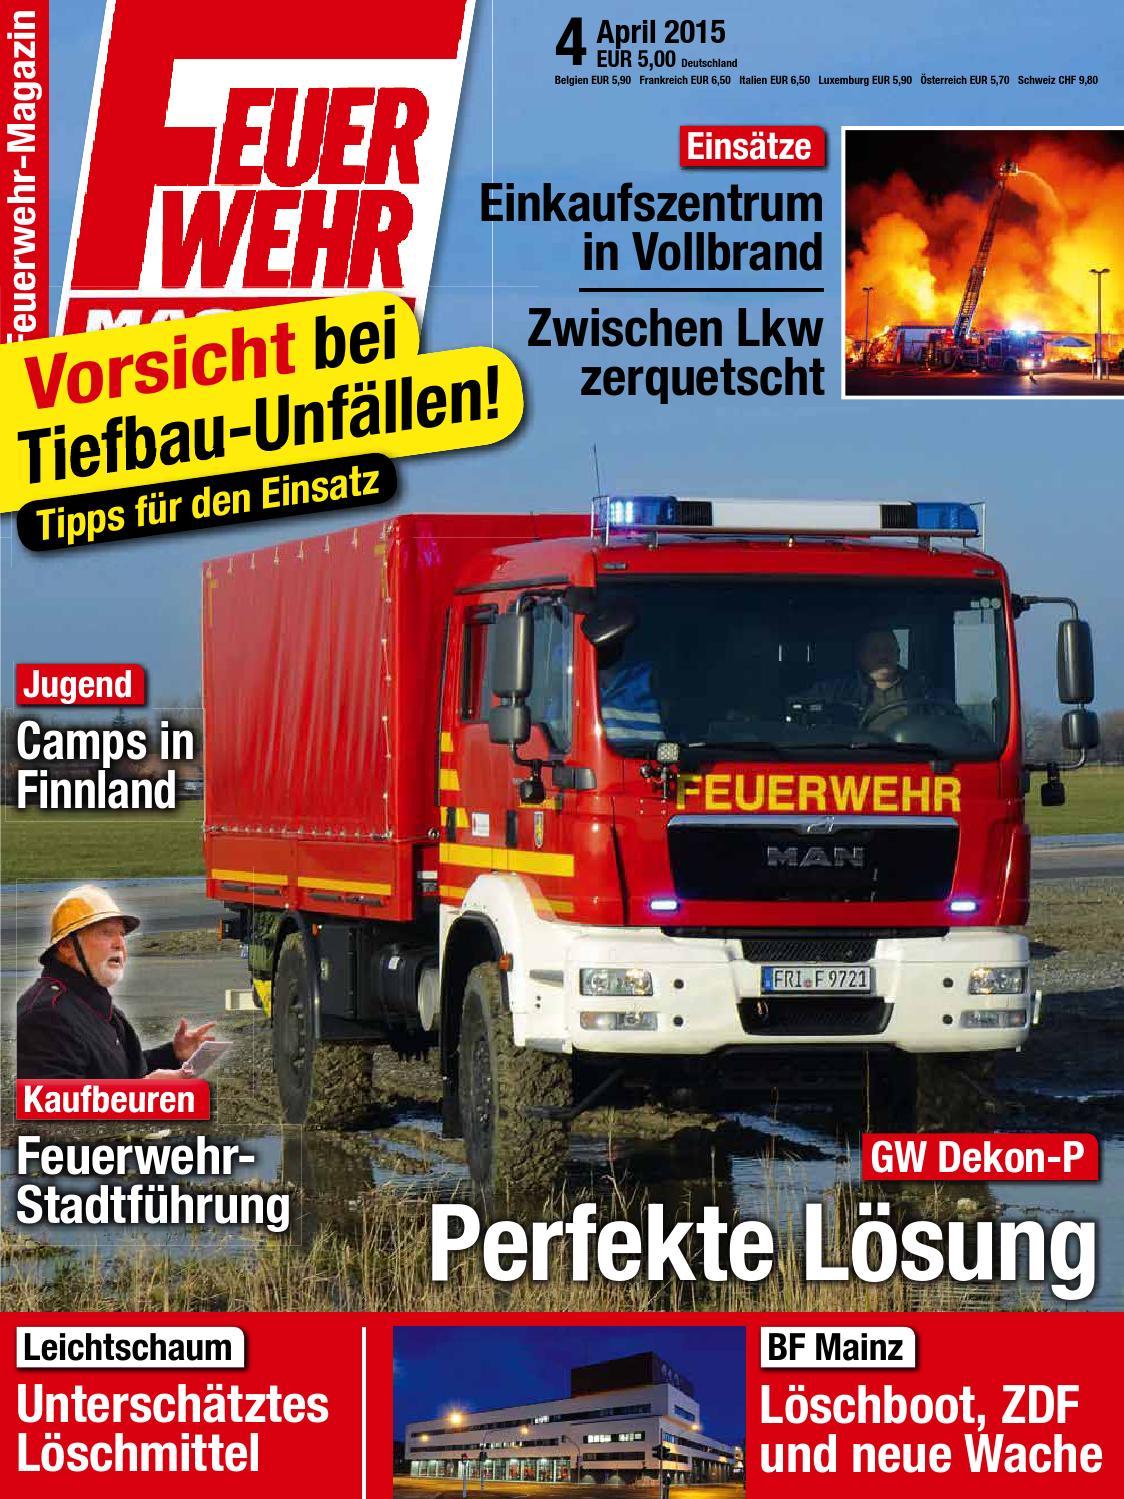 Feuerwehr magazin juni 06 2015 by Augusto Dantas - issuu